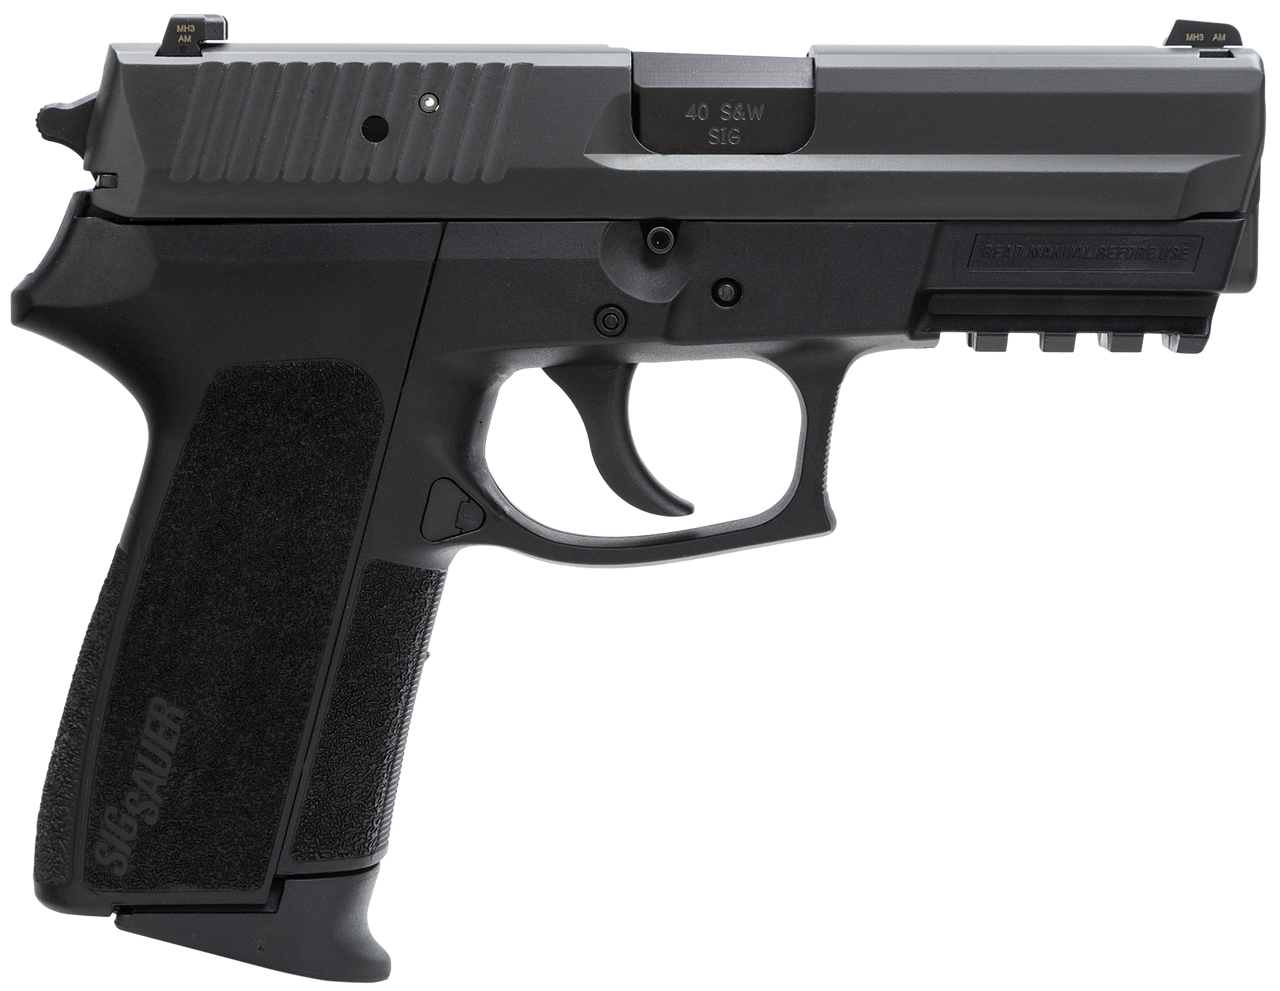 Sig Sauer SP2022 CALIFORNIA LEGAL - 9mm